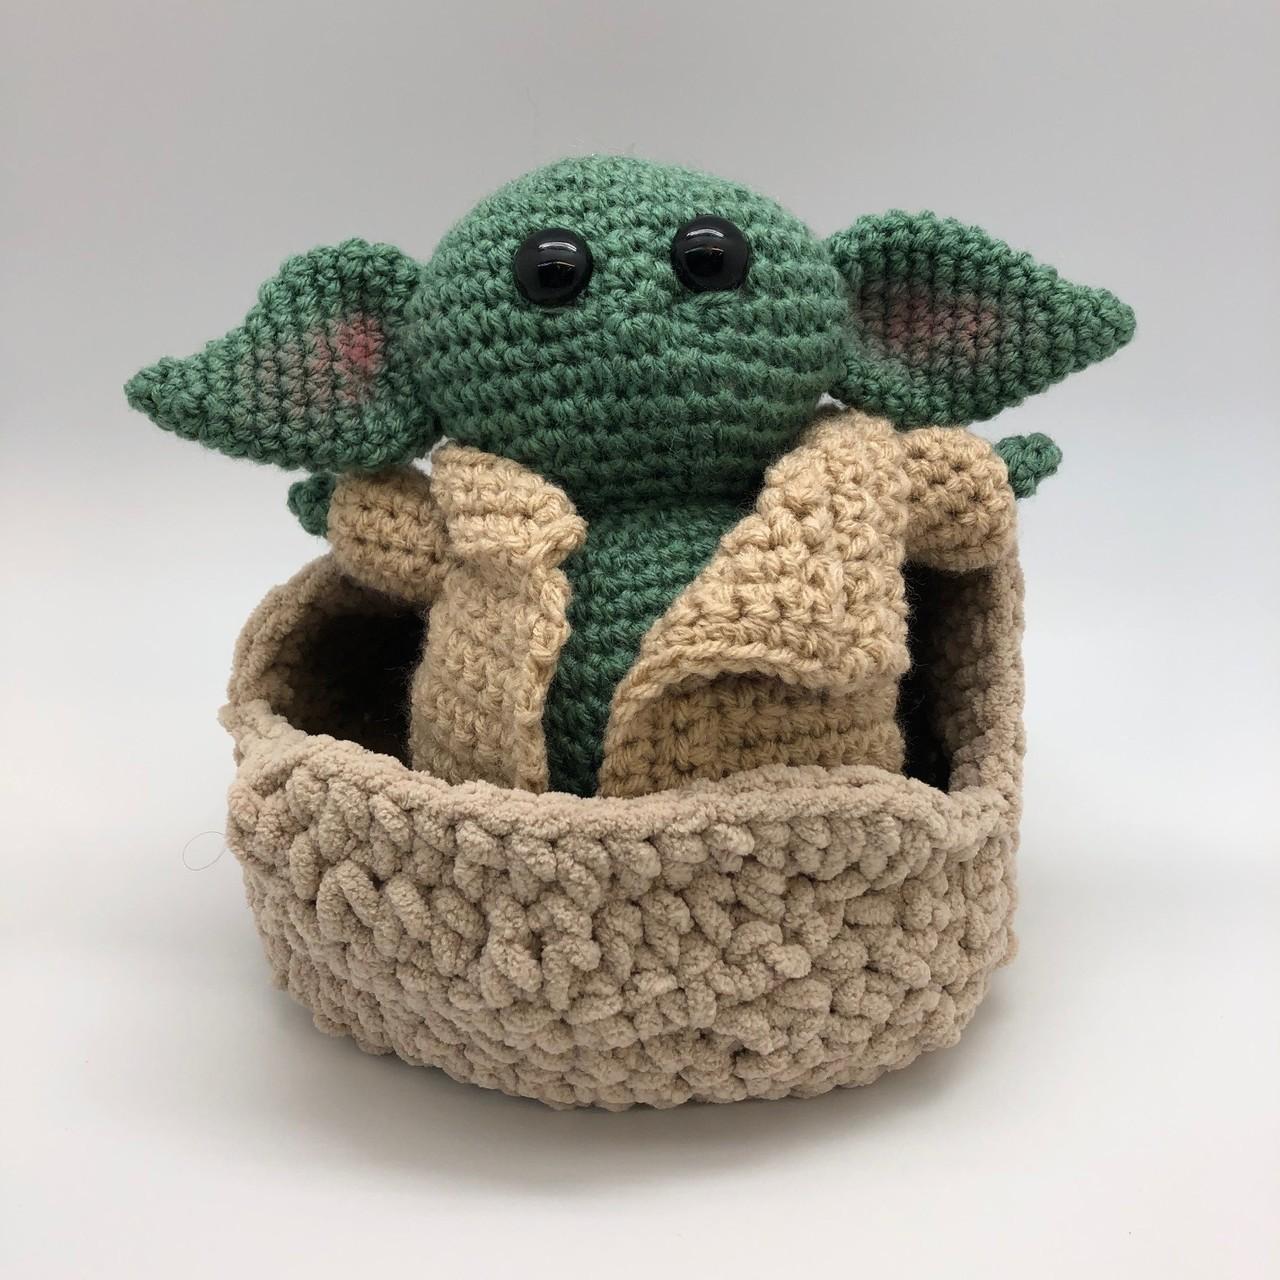 "Star Wars Inspired ""The Child"" Crochet Plush"